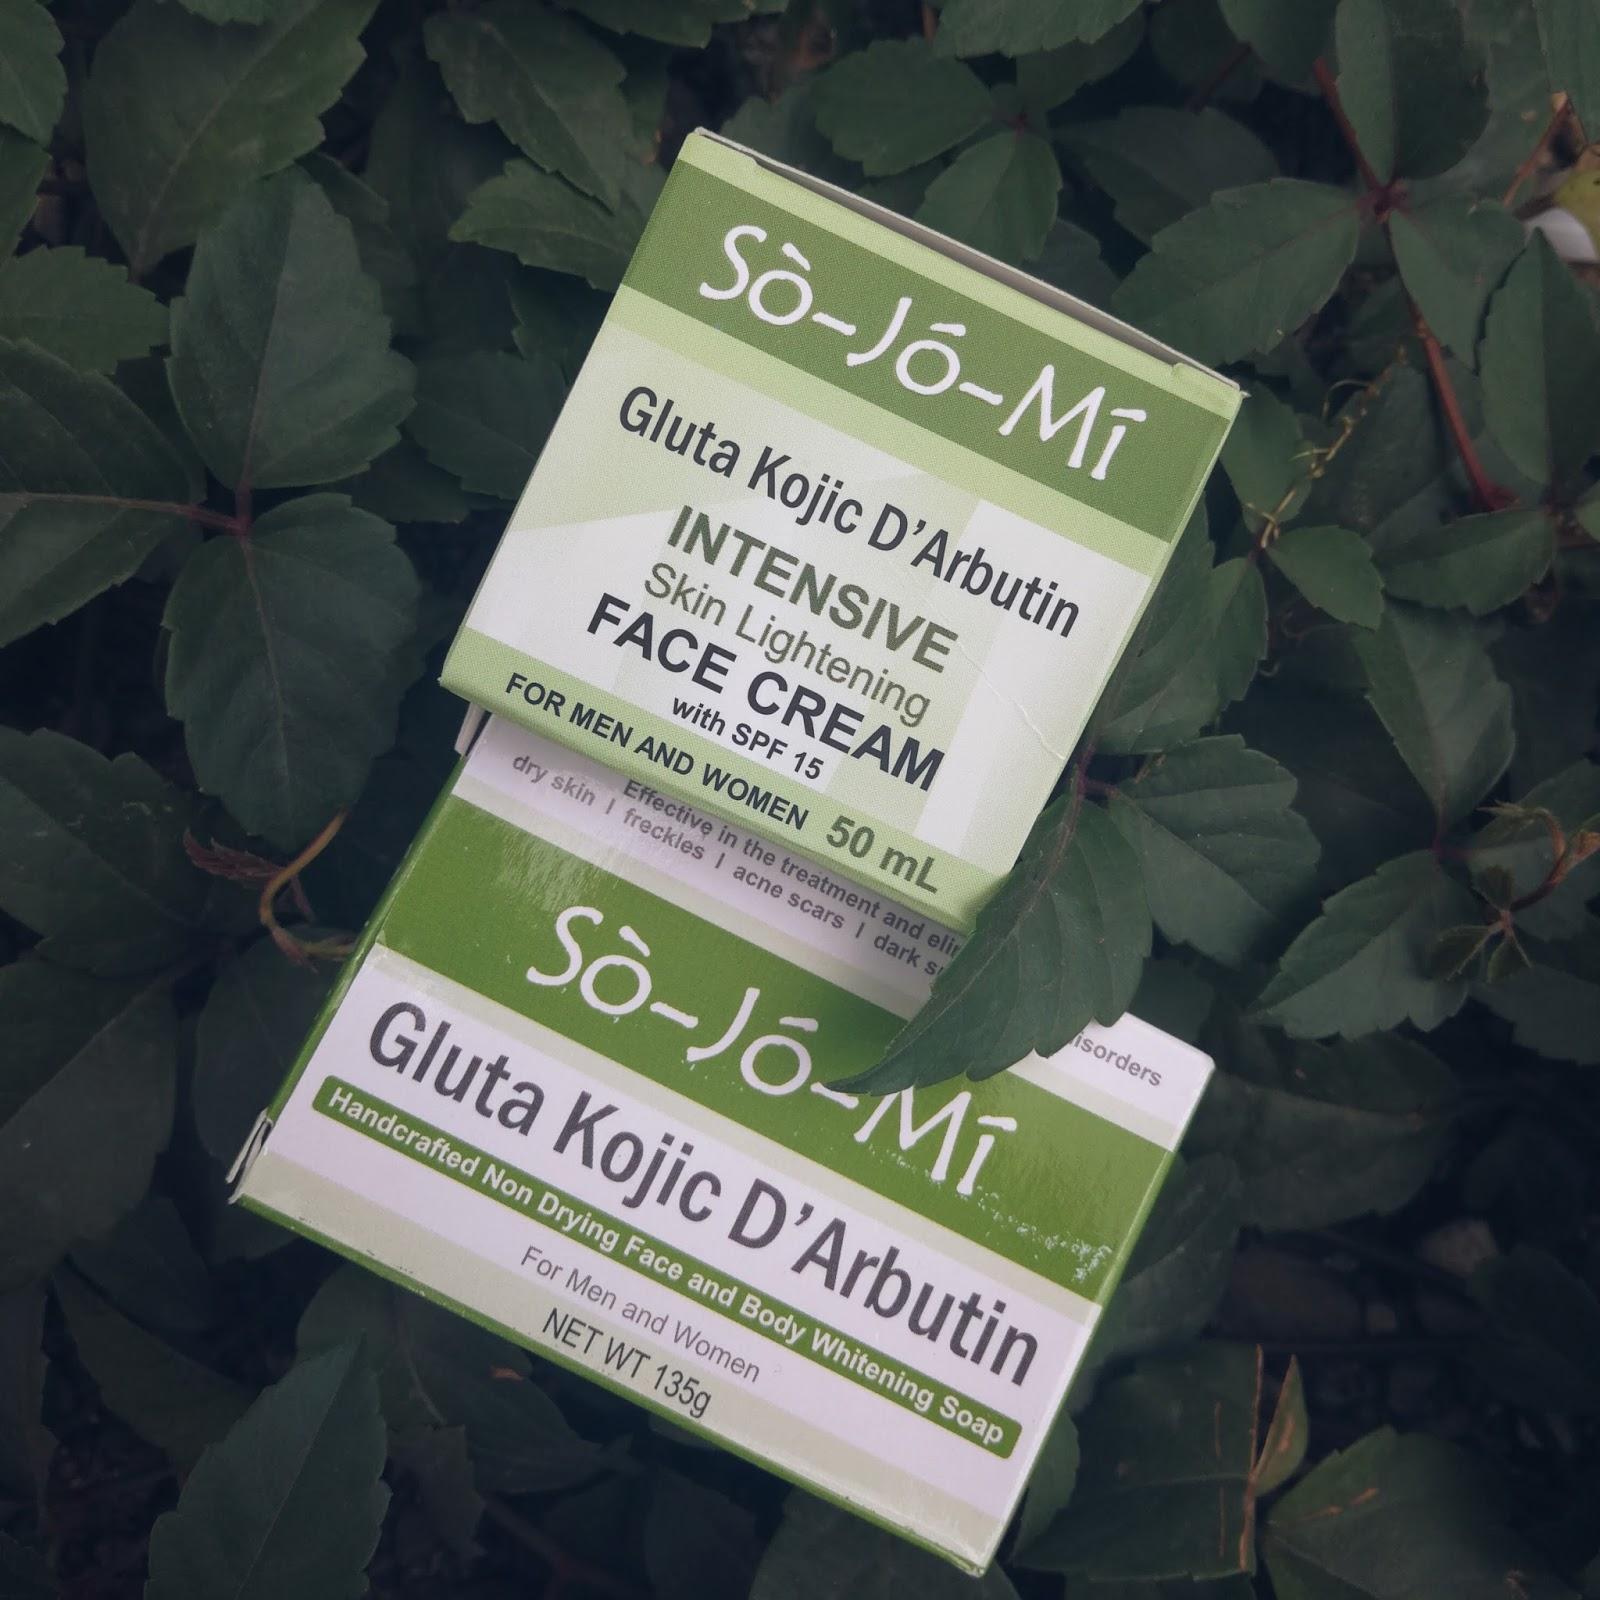 SoJoMi Gluta Kojic D'Arbutin Whitening Soap & Cream REVIEW